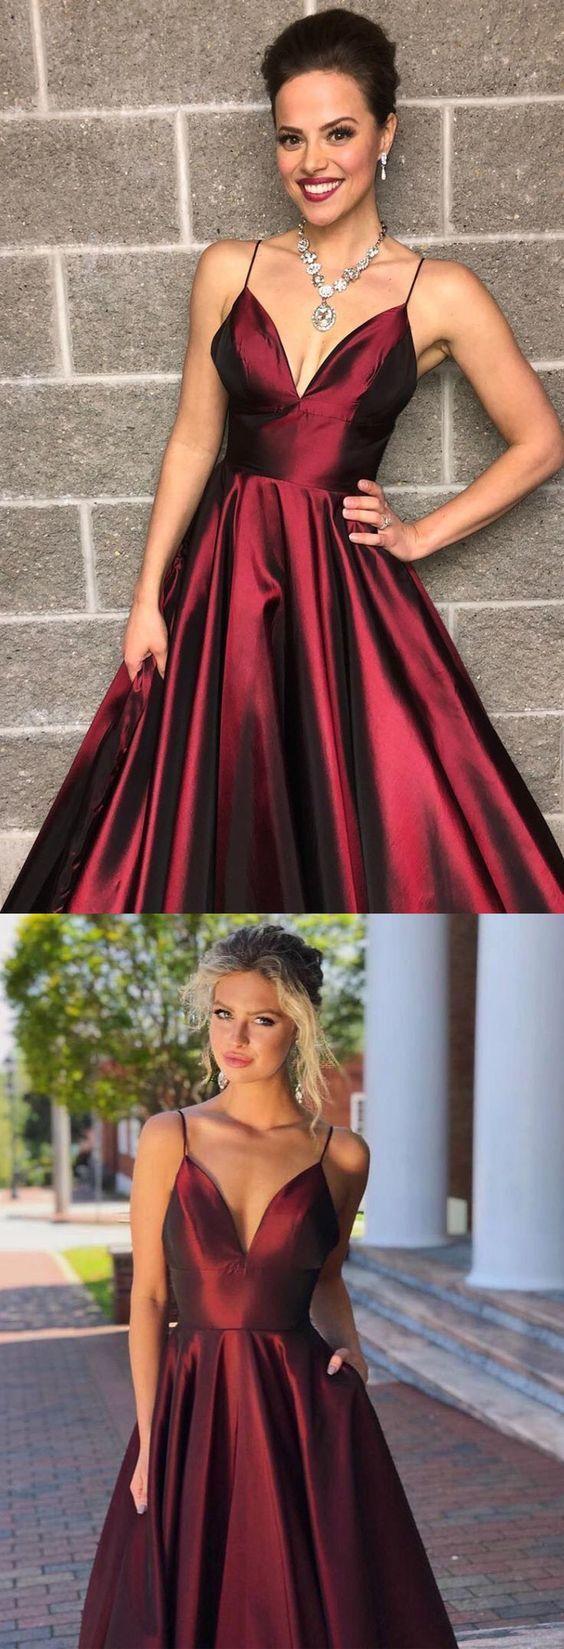 Elegant Burgundy Long Prom Dress with Spaghetti Straps M10336